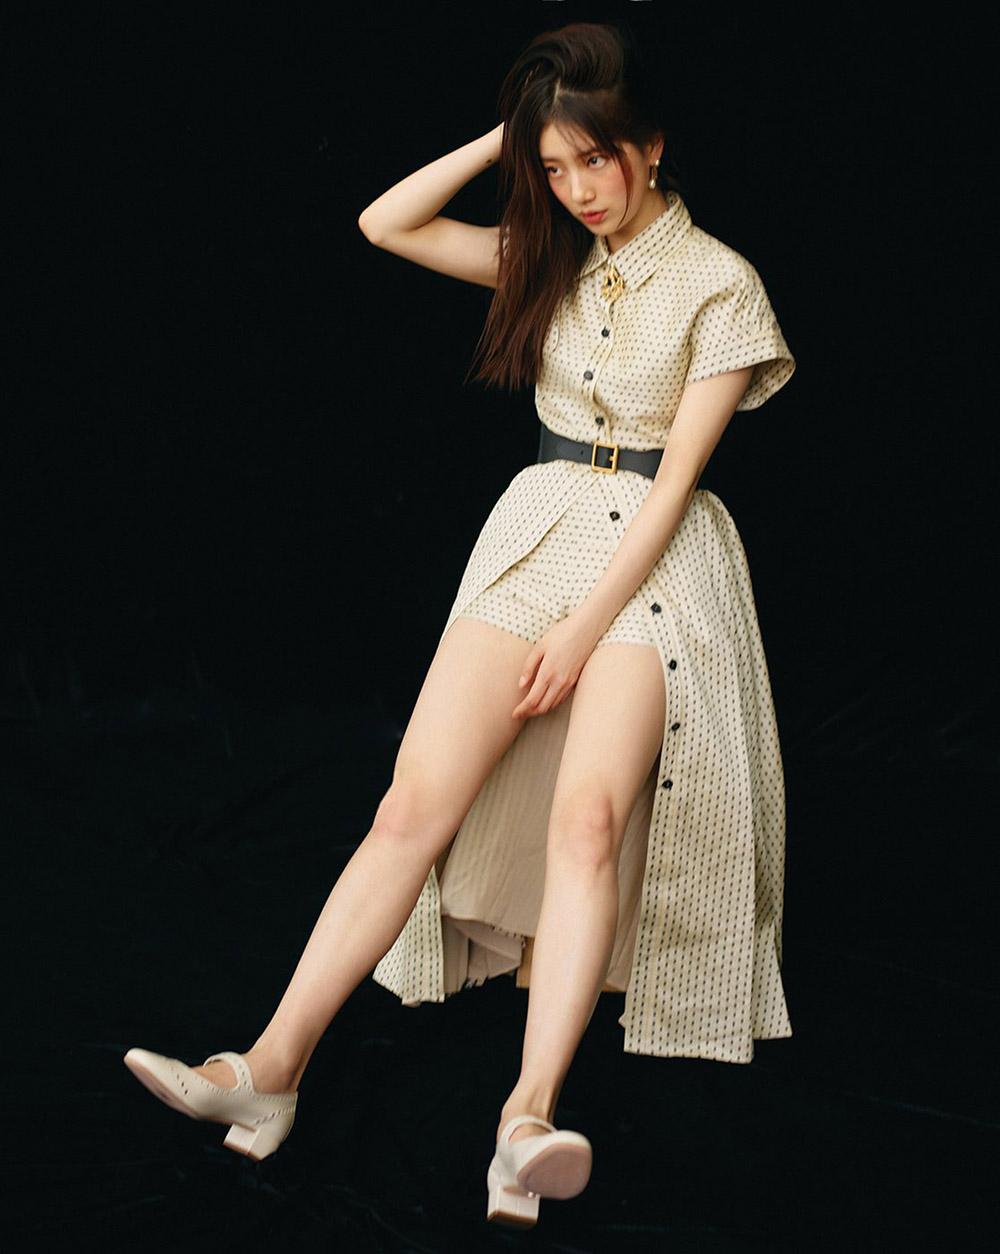 Suzy covers Vogue Korea June 2020 by Hyea W. Kang